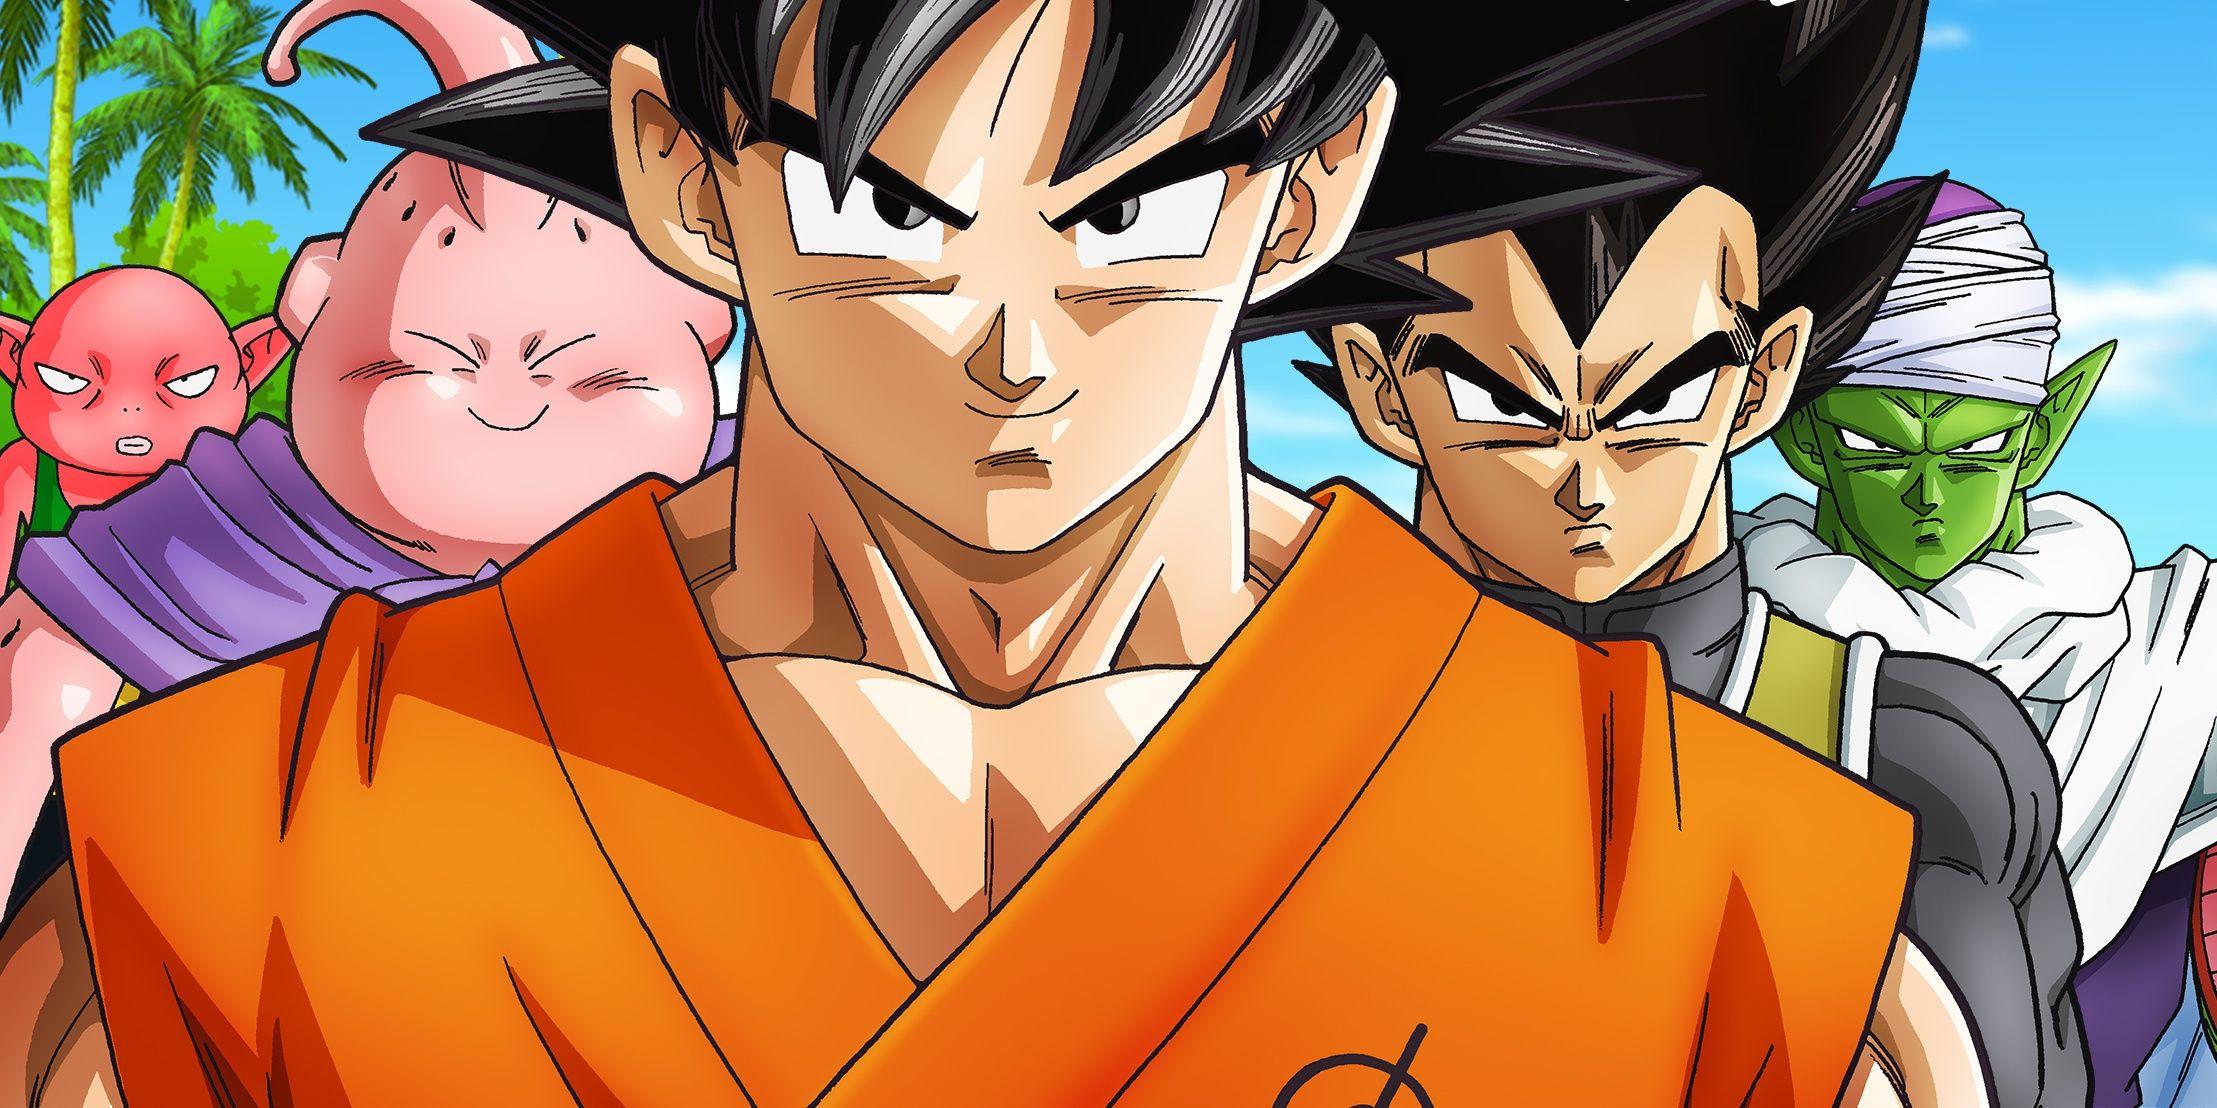 Dragon Ball Super: Vegeta Returns, And Hes More Powerful